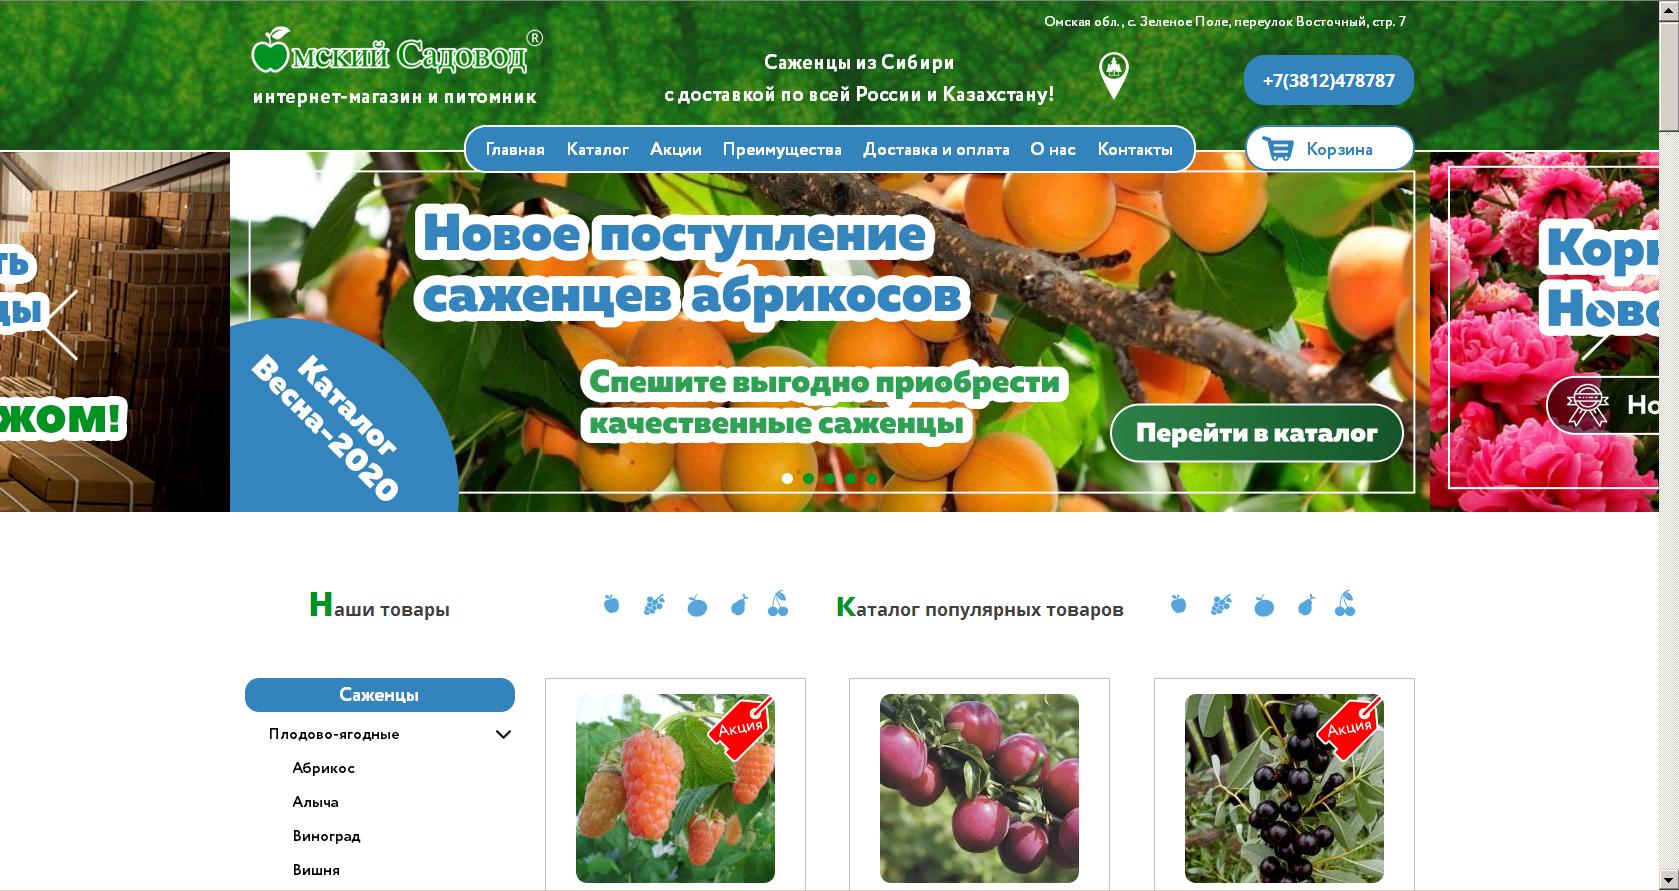 логотип omsksadovod.ru